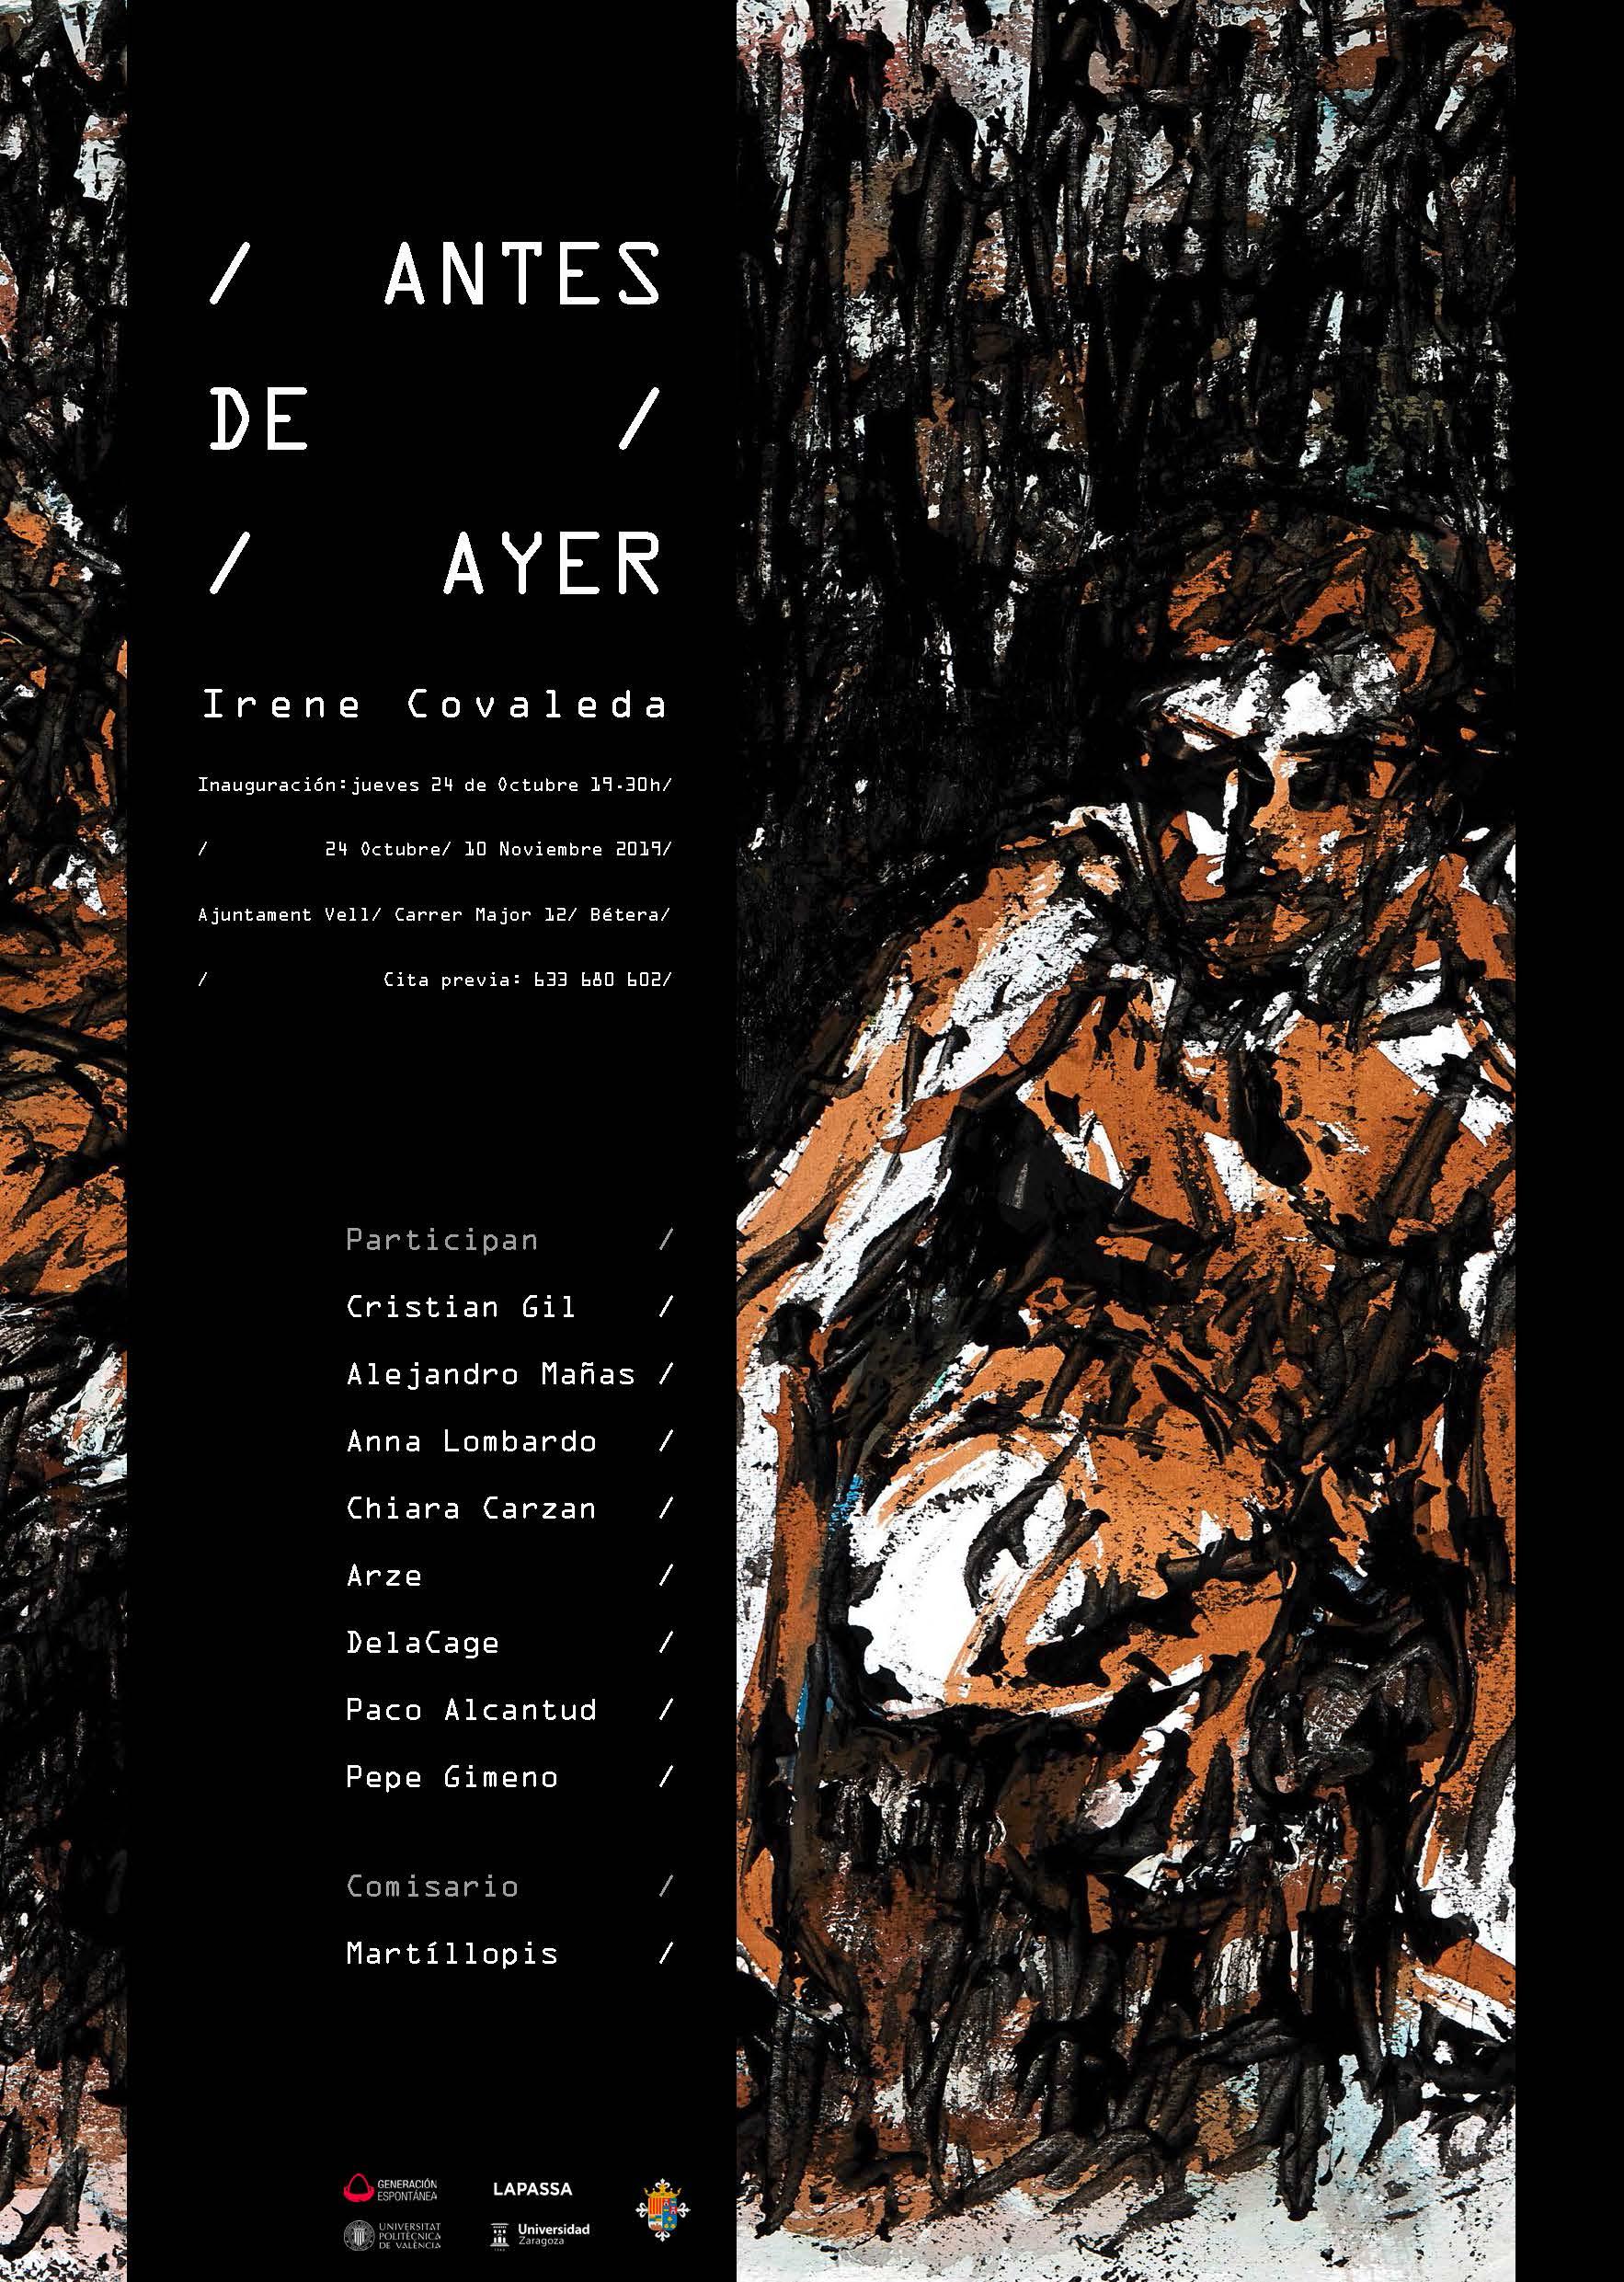 ANTES DE AYER de irene Covaleda & colectiva